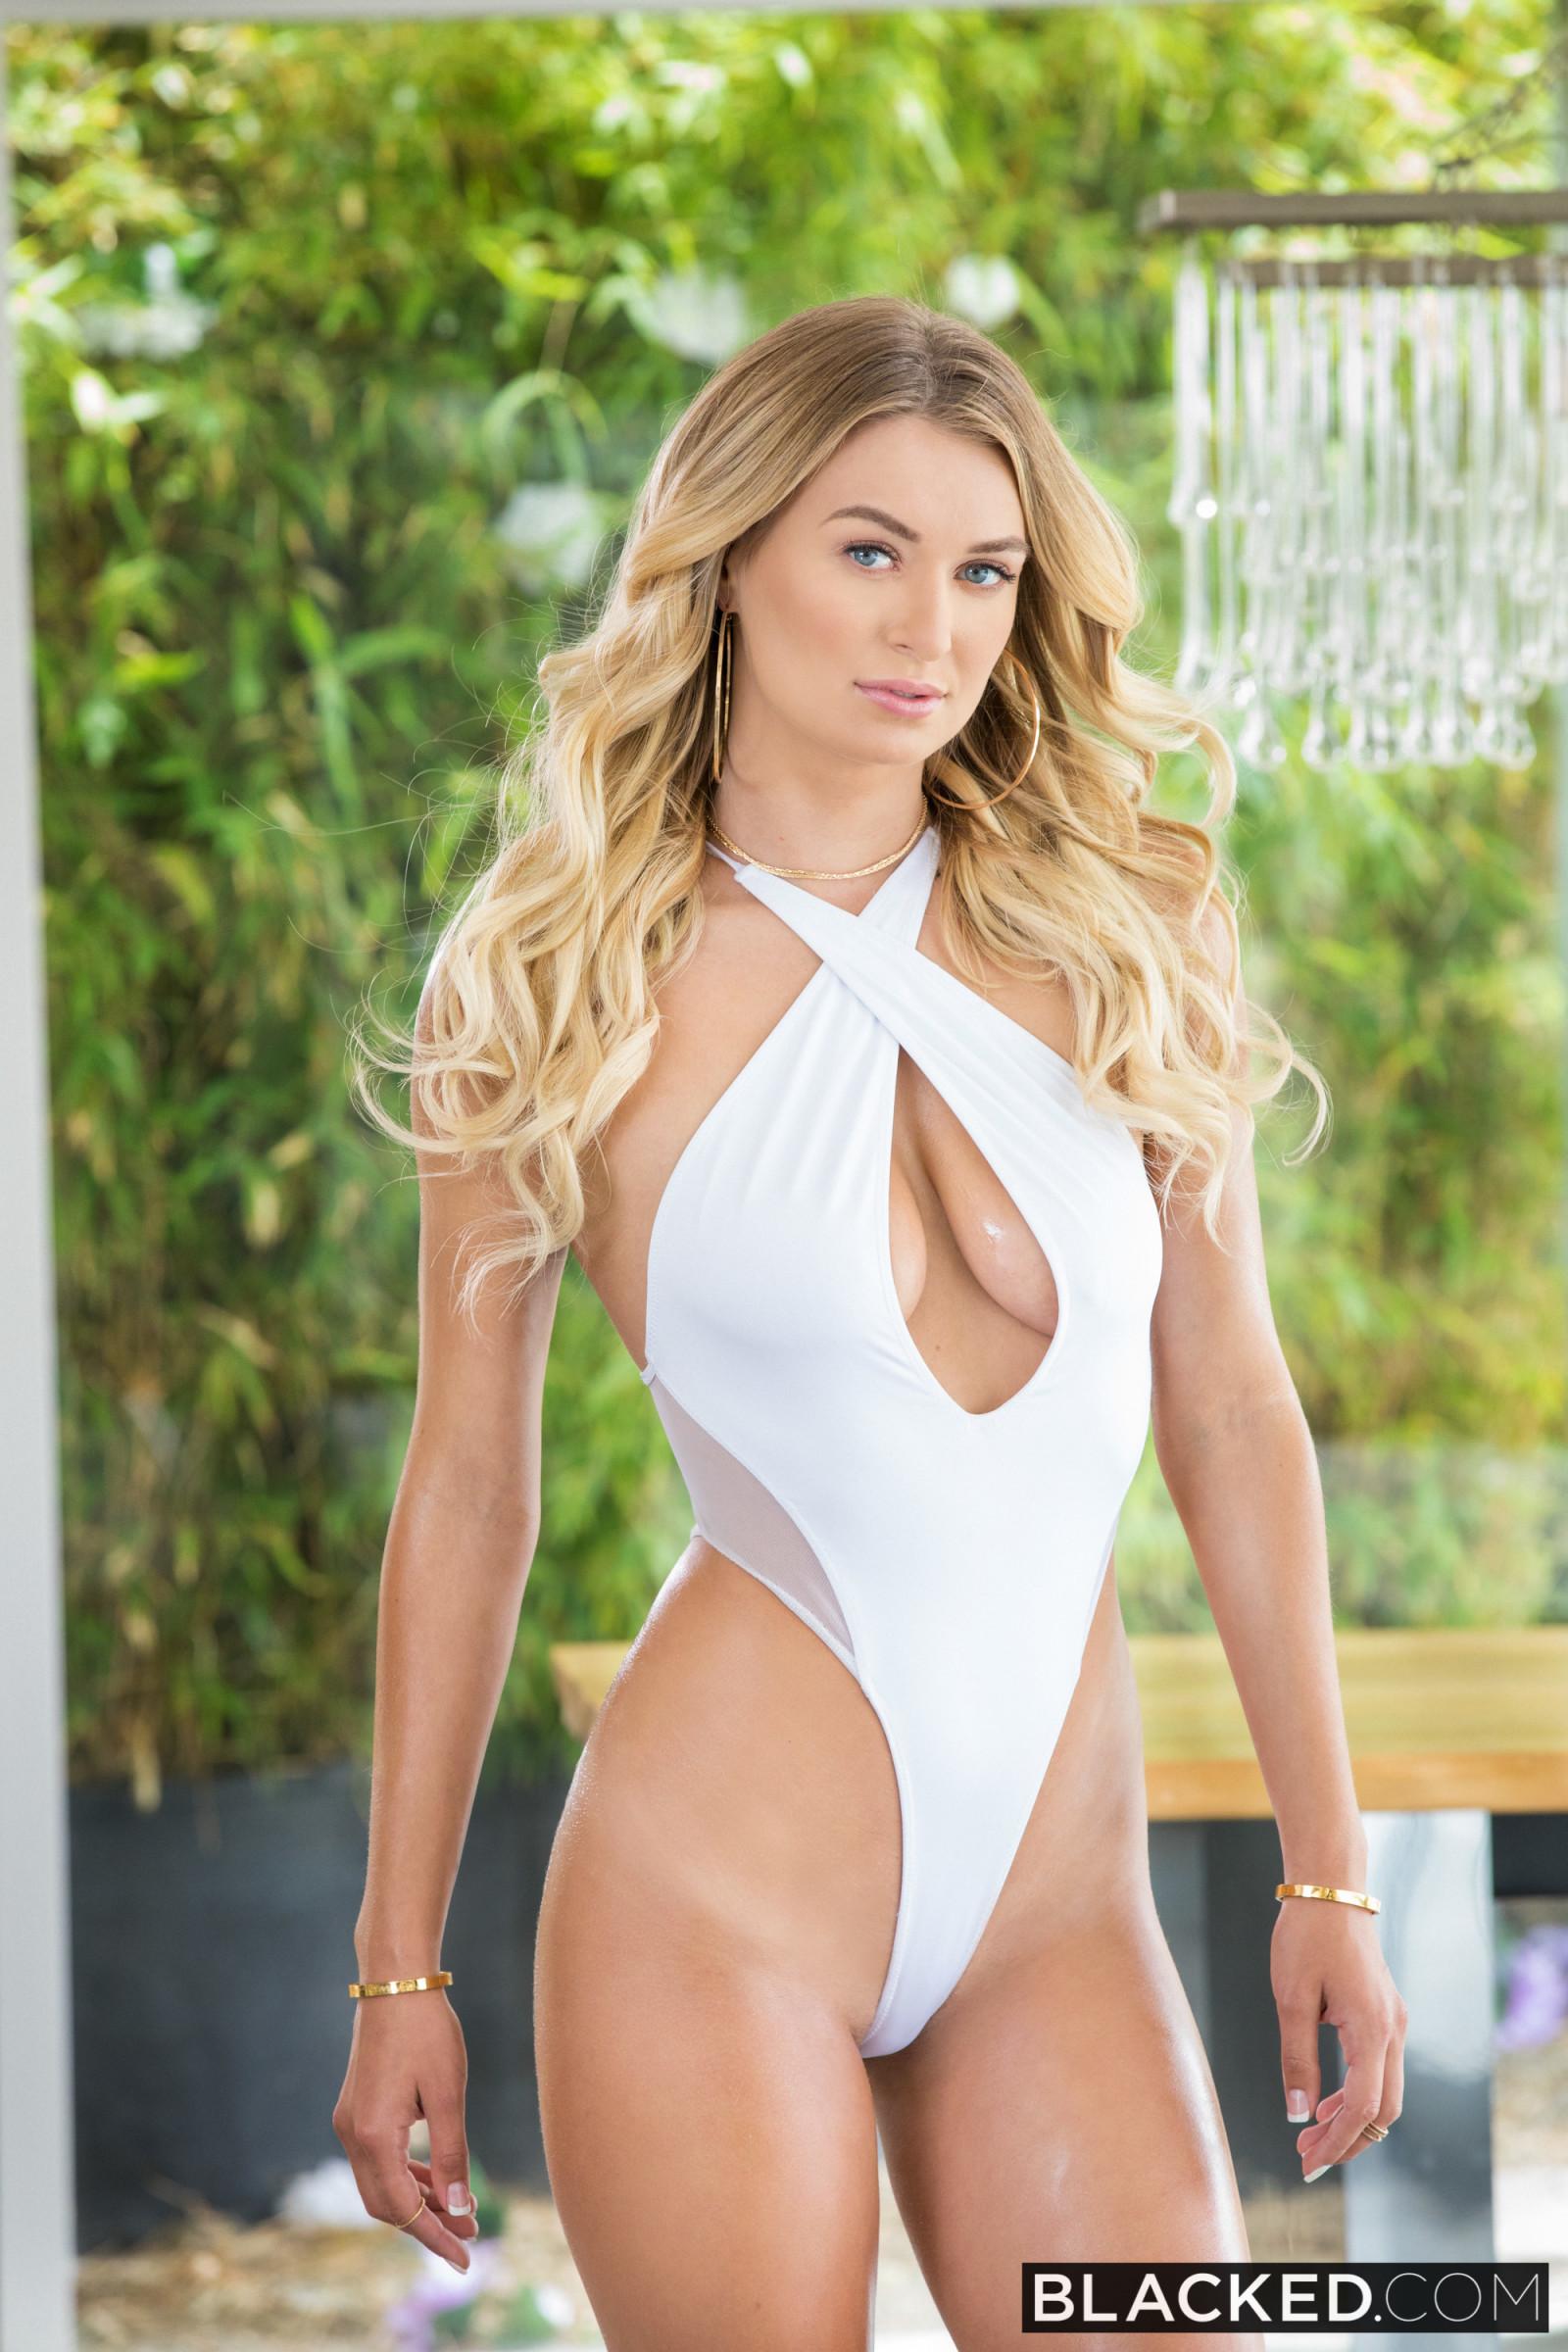 Wallpaper  Natalia Starr, Model, Women, Actress, Looking -8615